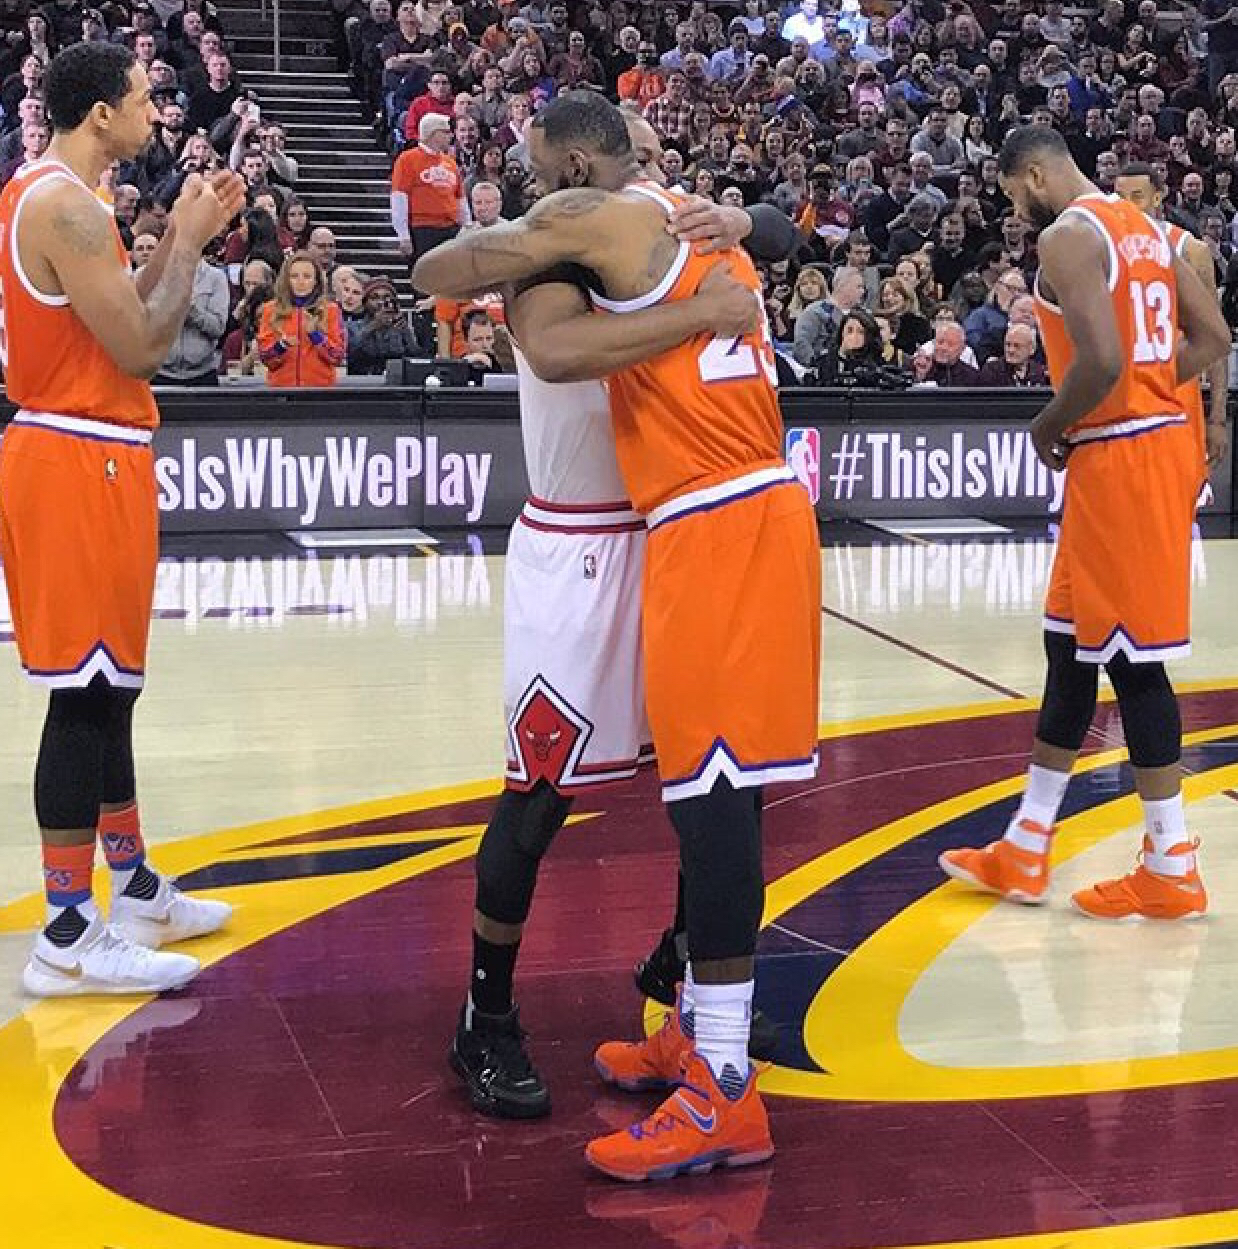 NBA官方晒詹韦赛前拥抱照片